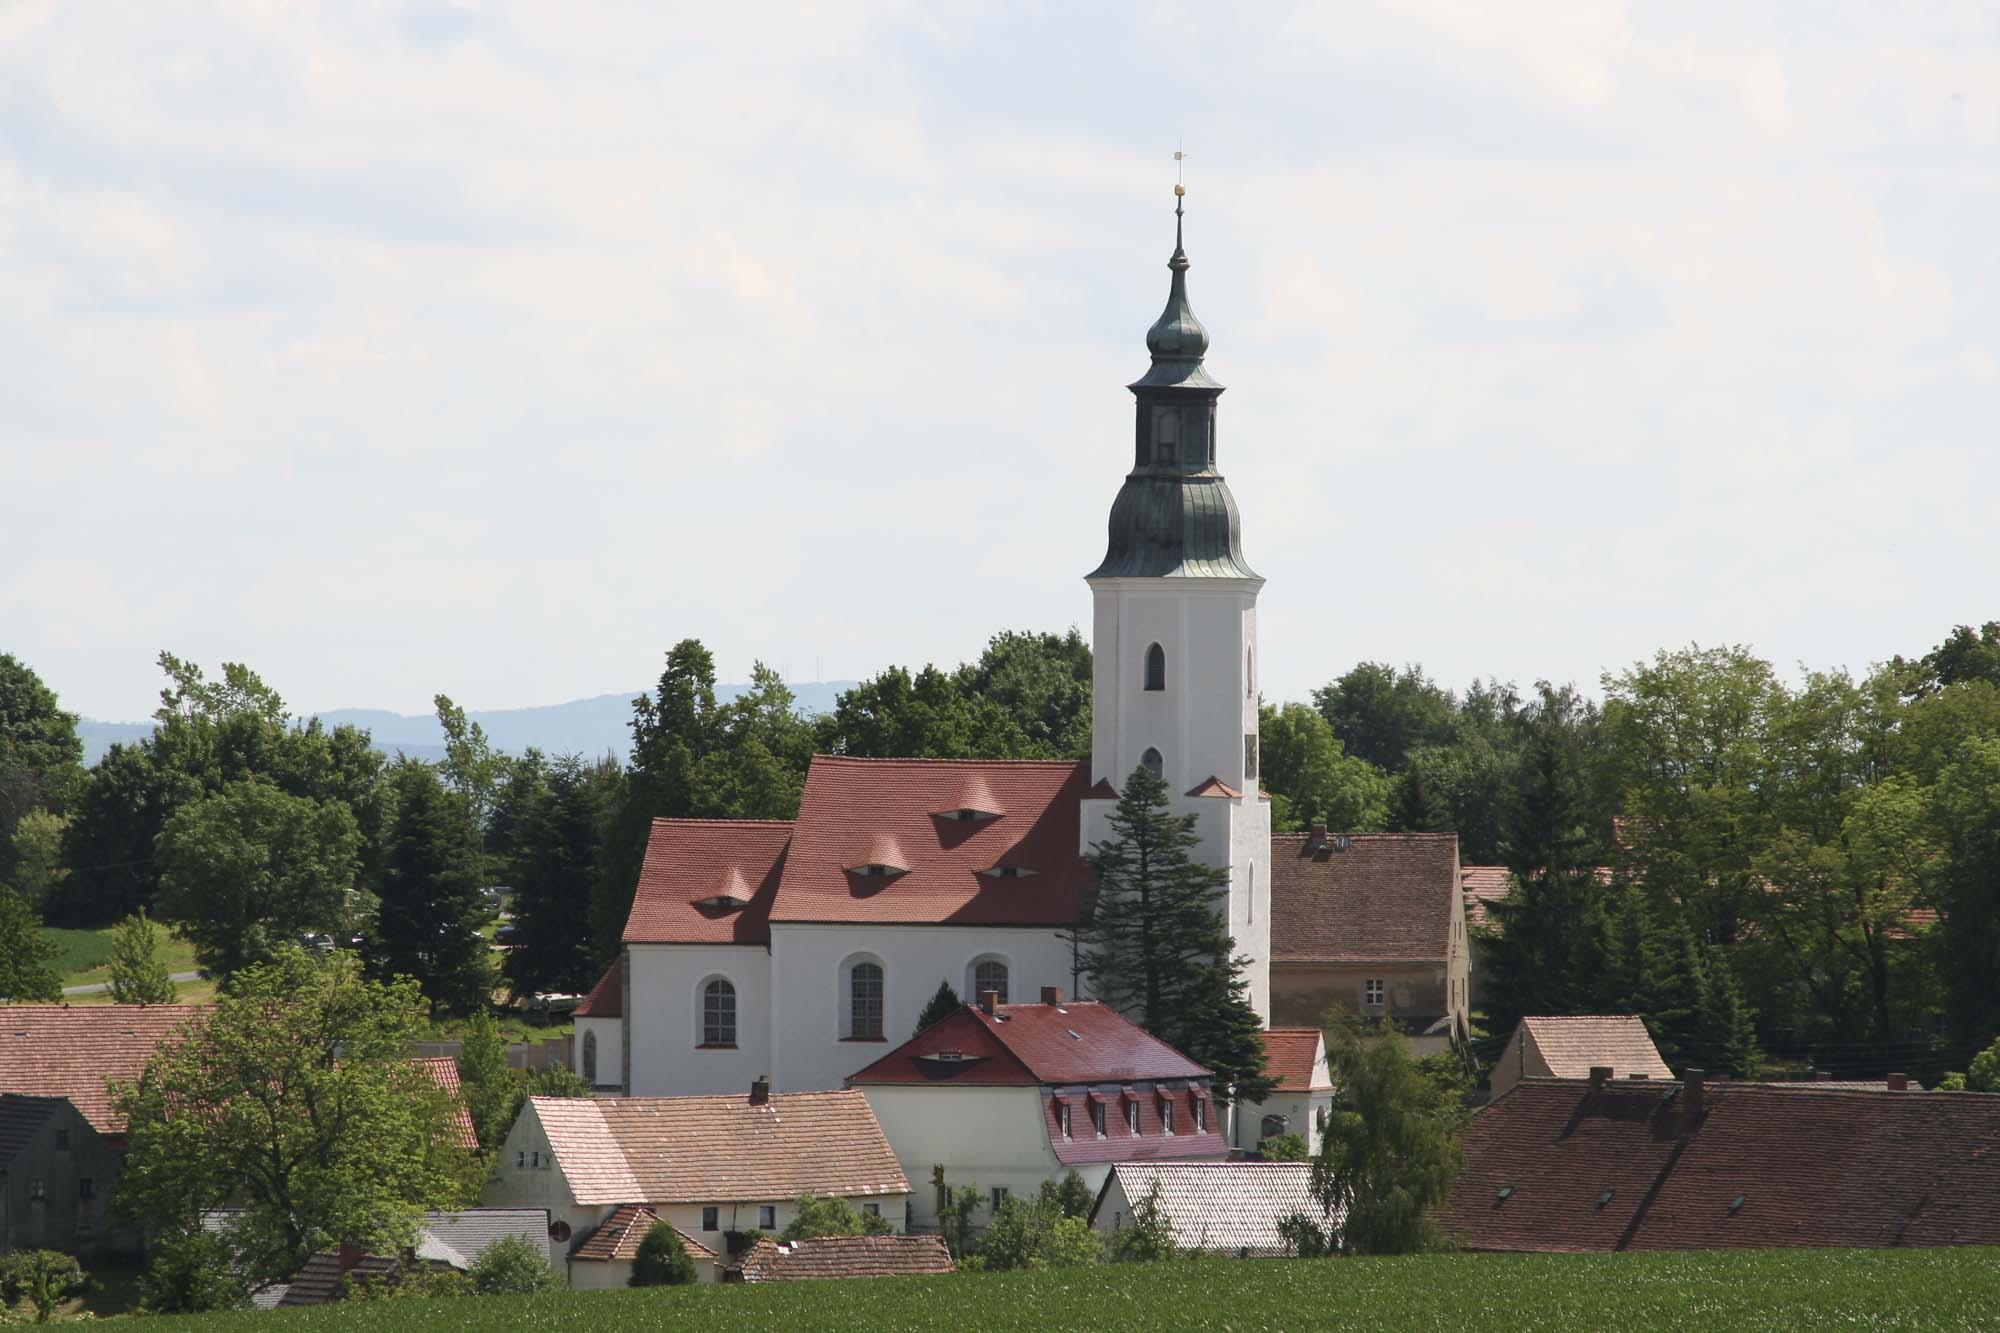 St. Ursula zu Friedersdorf